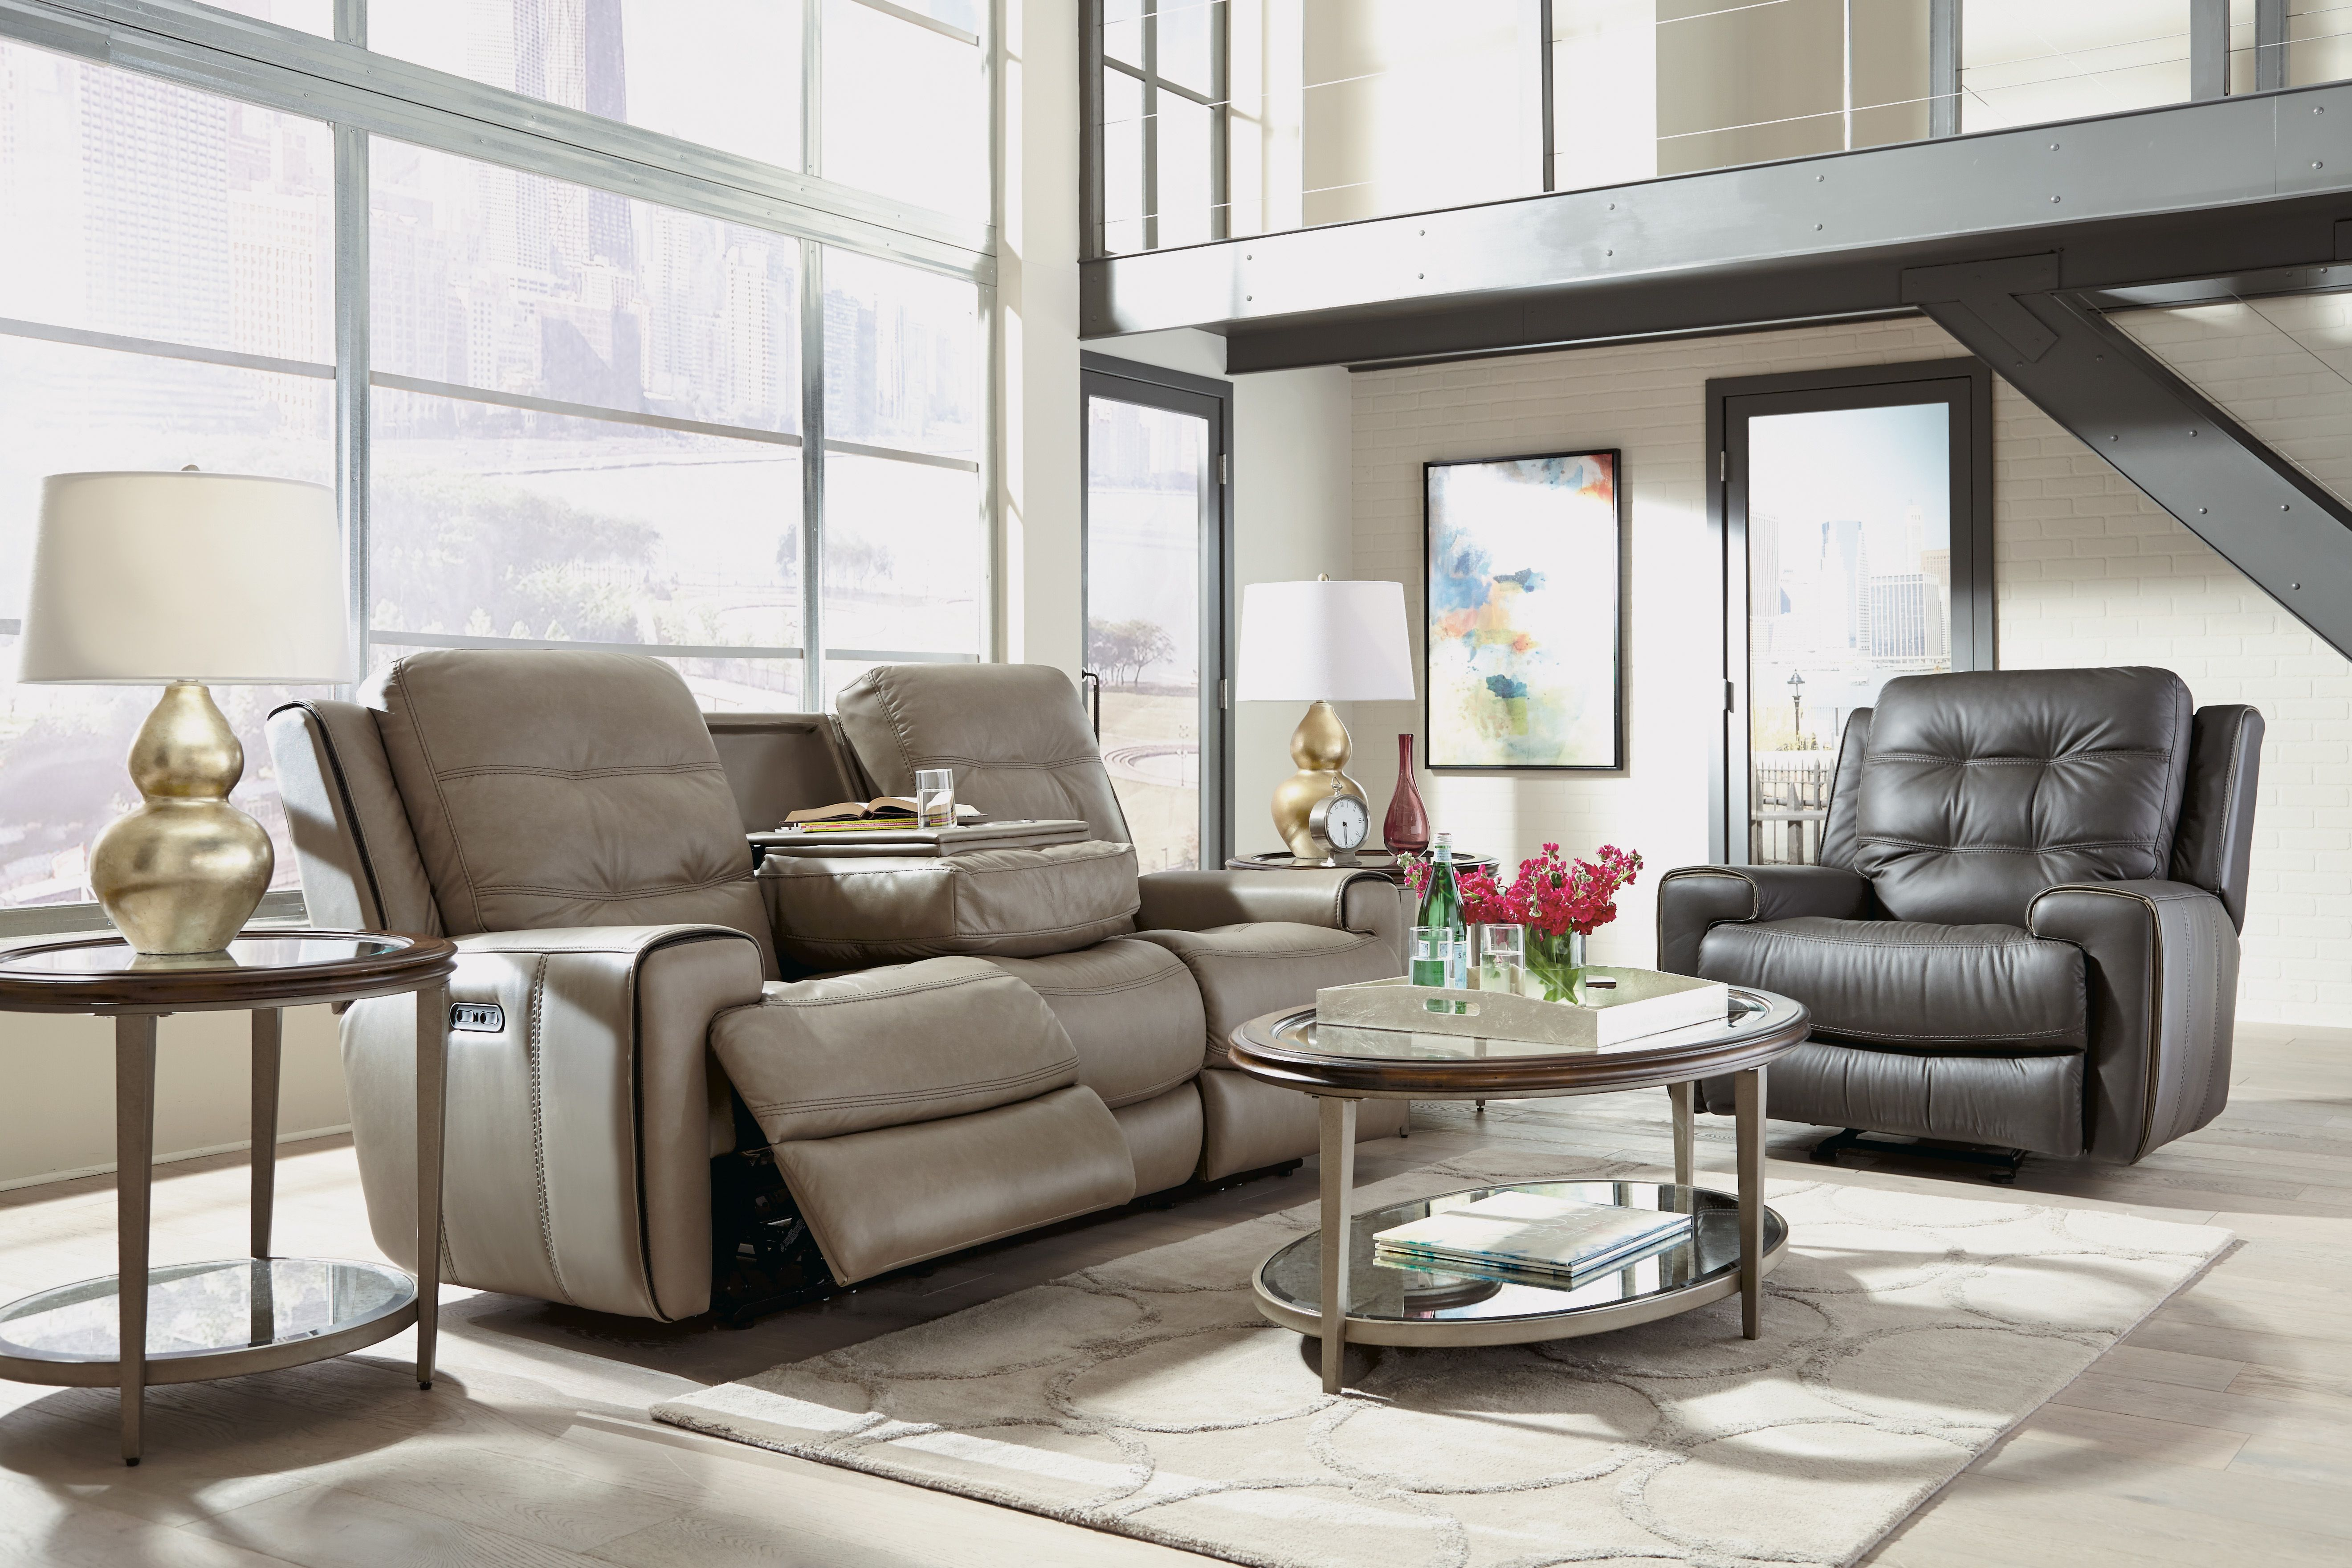 Flexsteel Wicklow Leather Power Reclining Sofa With Power Headrests